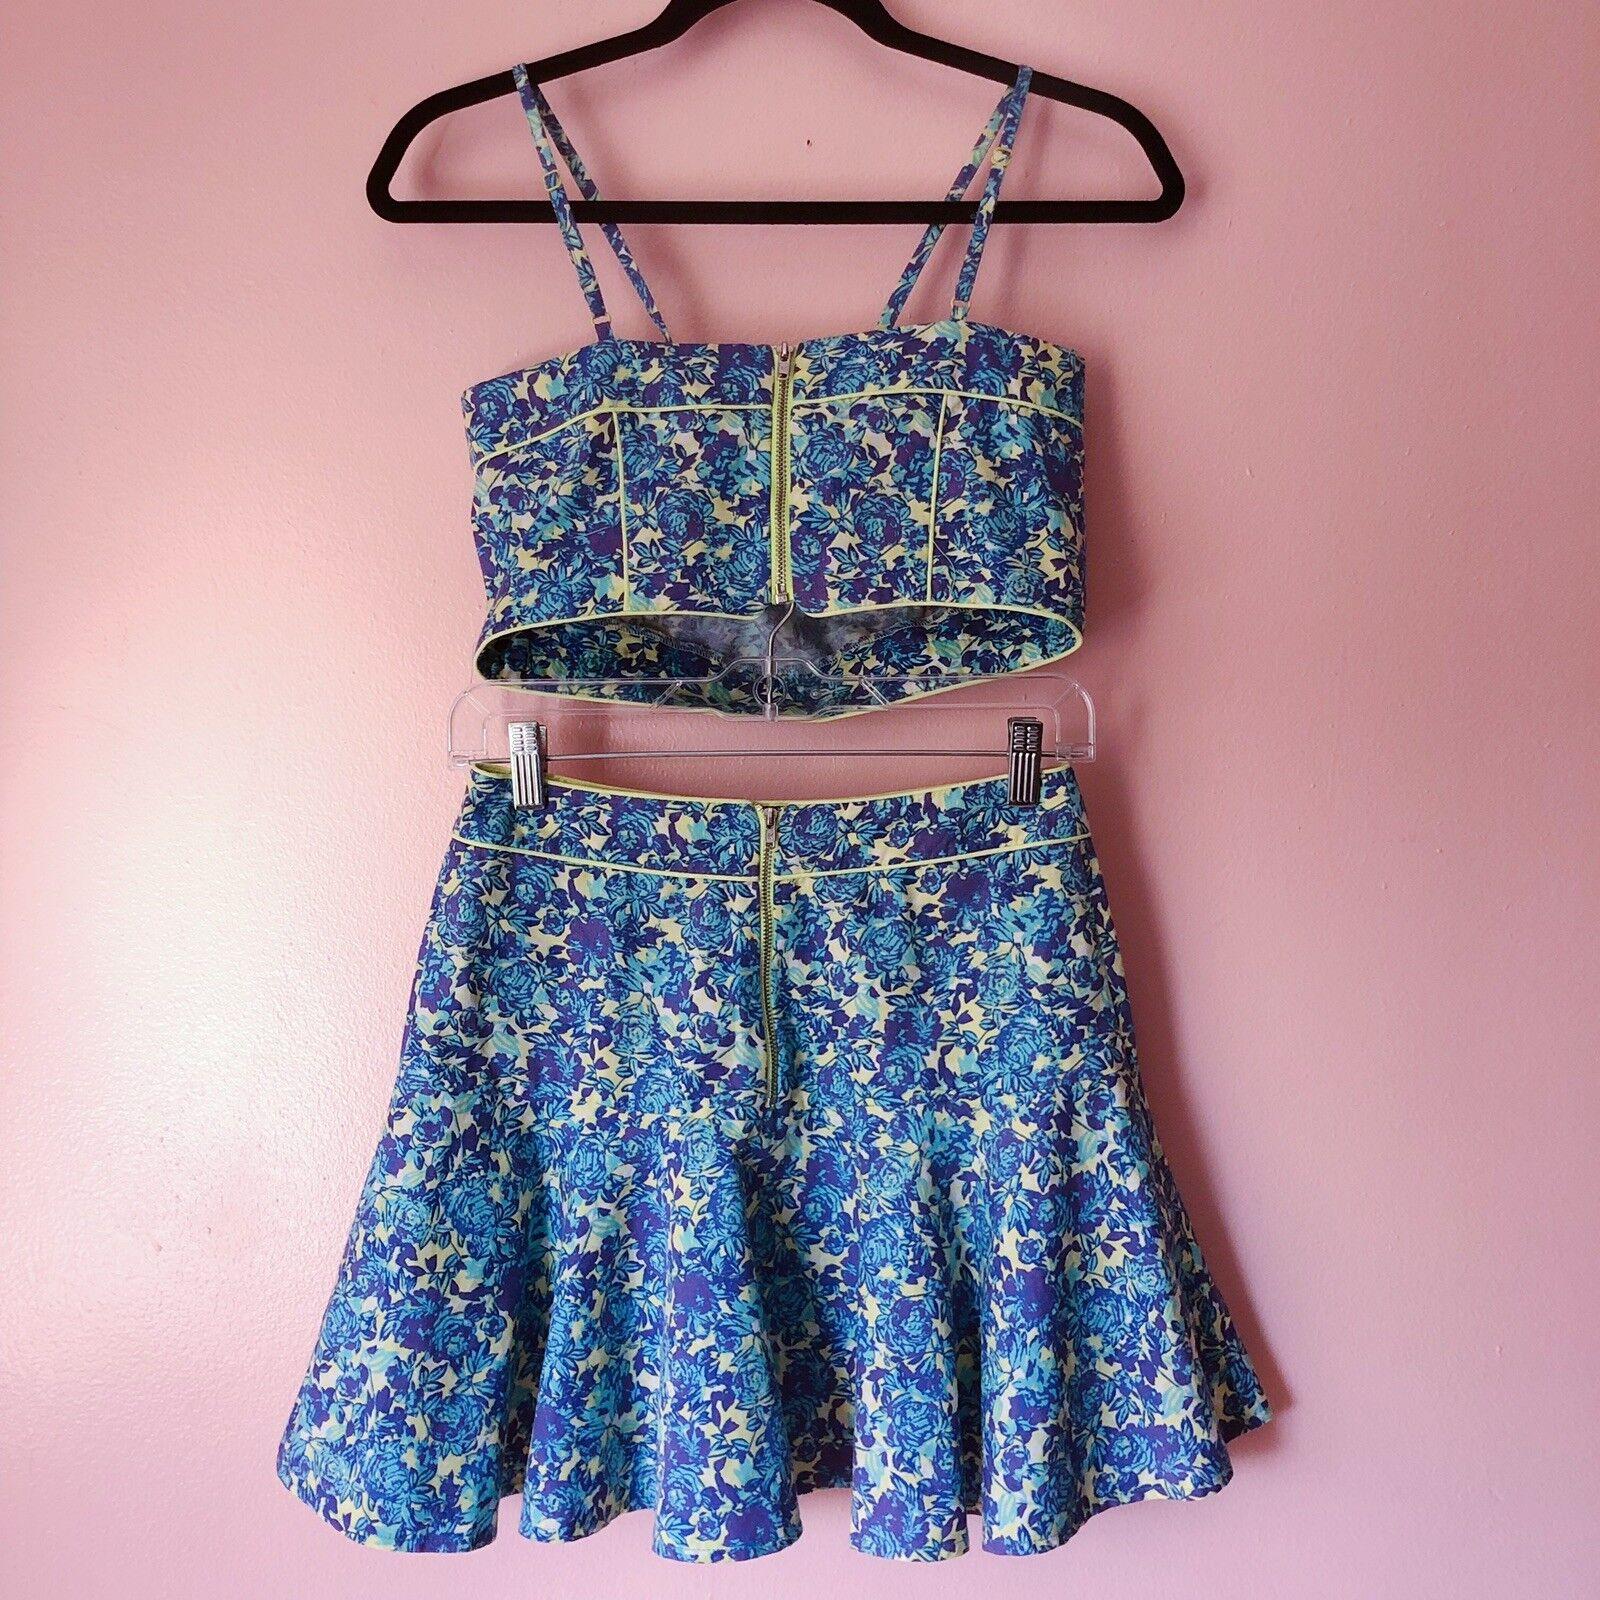 TopShop Neon Piped Floral Floral Floral Crop Skirt Set 526752